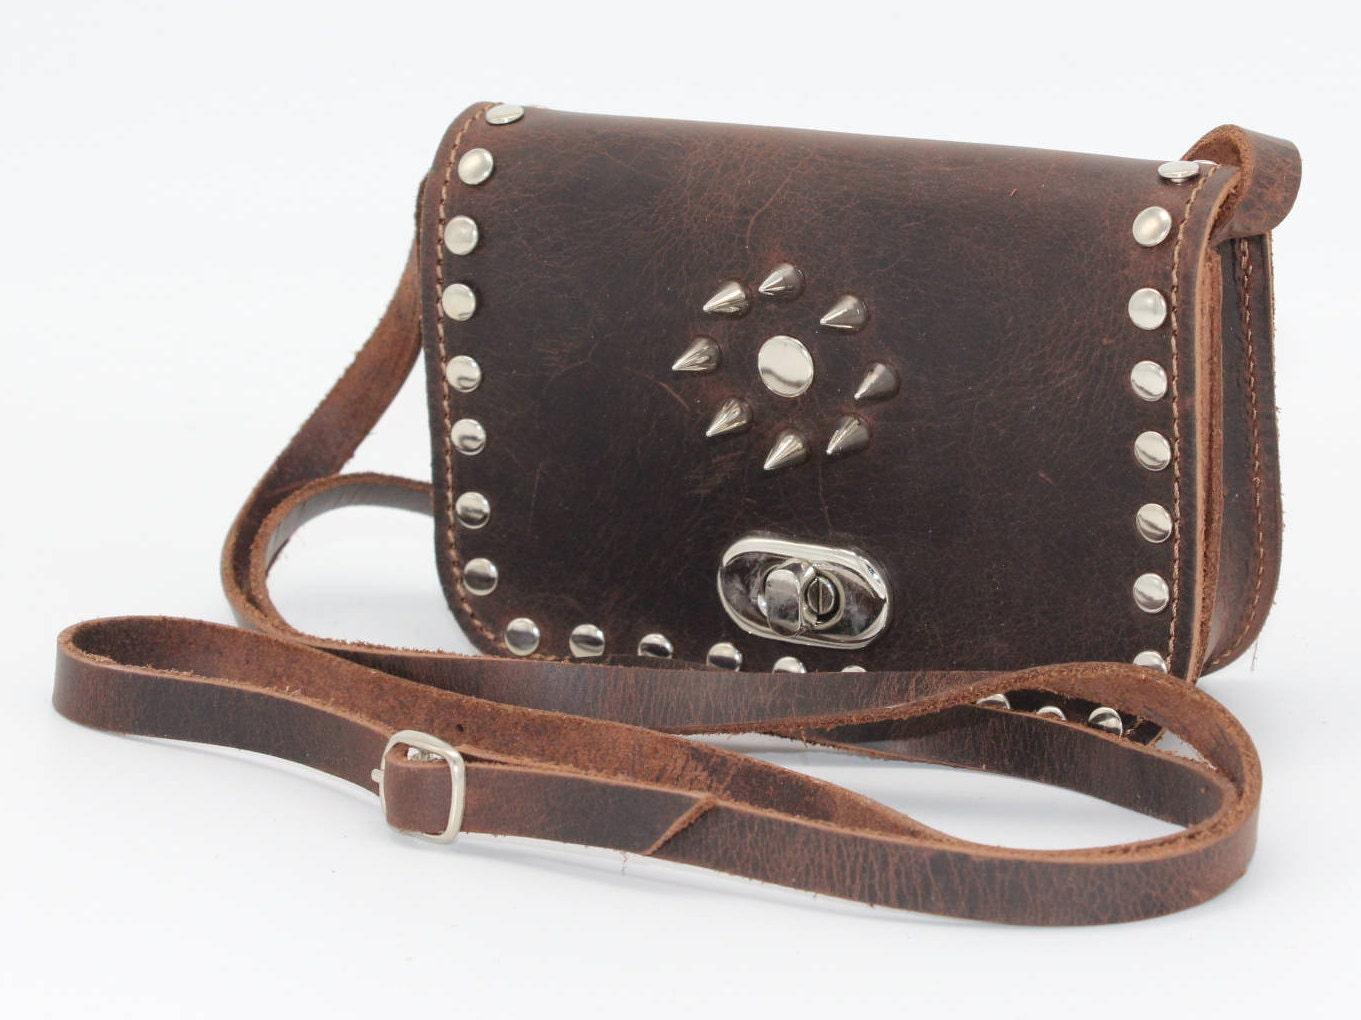 ae39c7fbb569 Small studded crossbody bag womens presentStudded bag